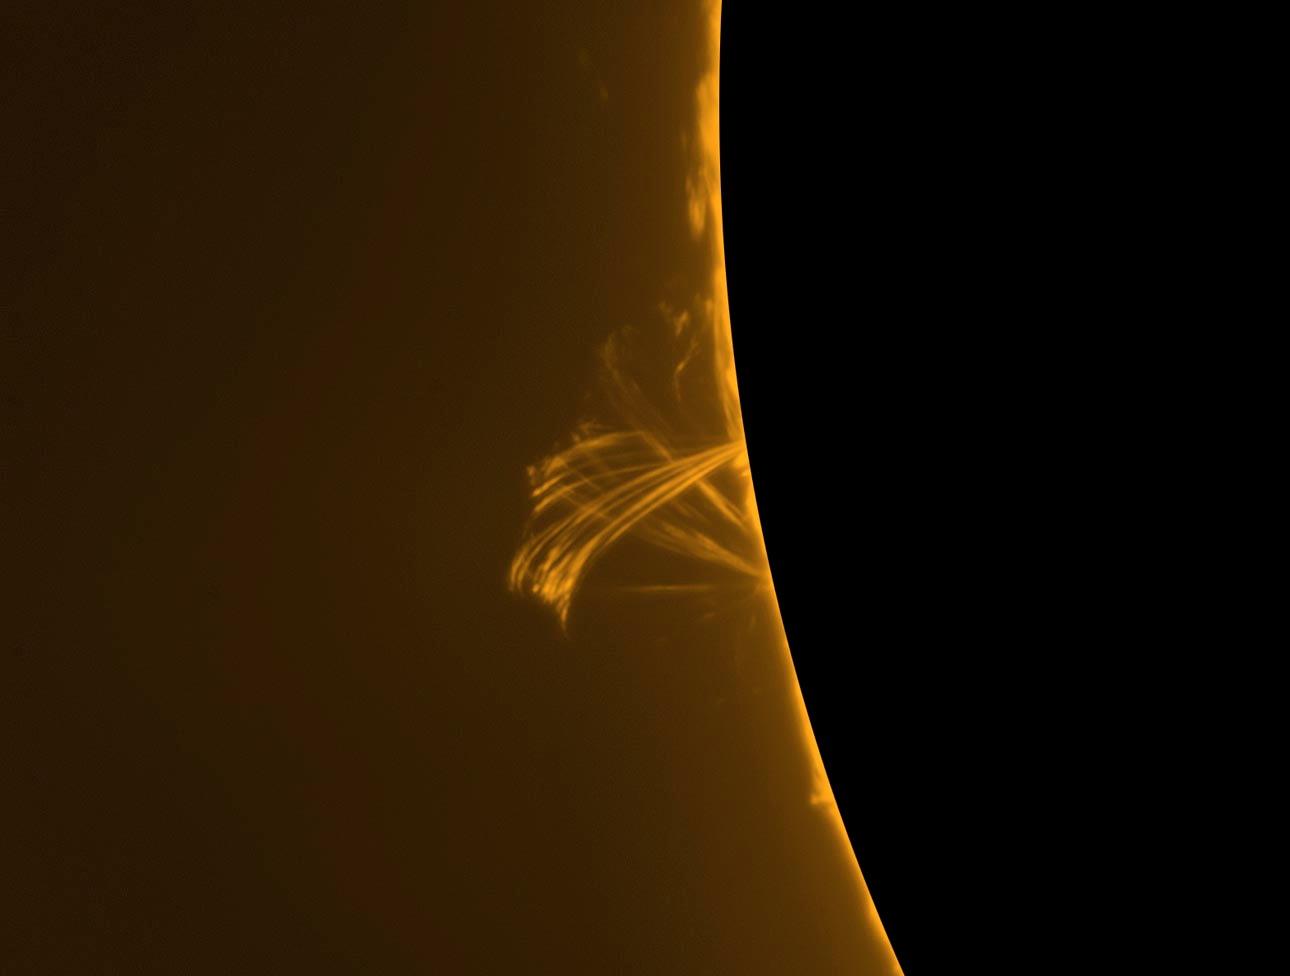 Solar Prominence, Dec. 31, 2013